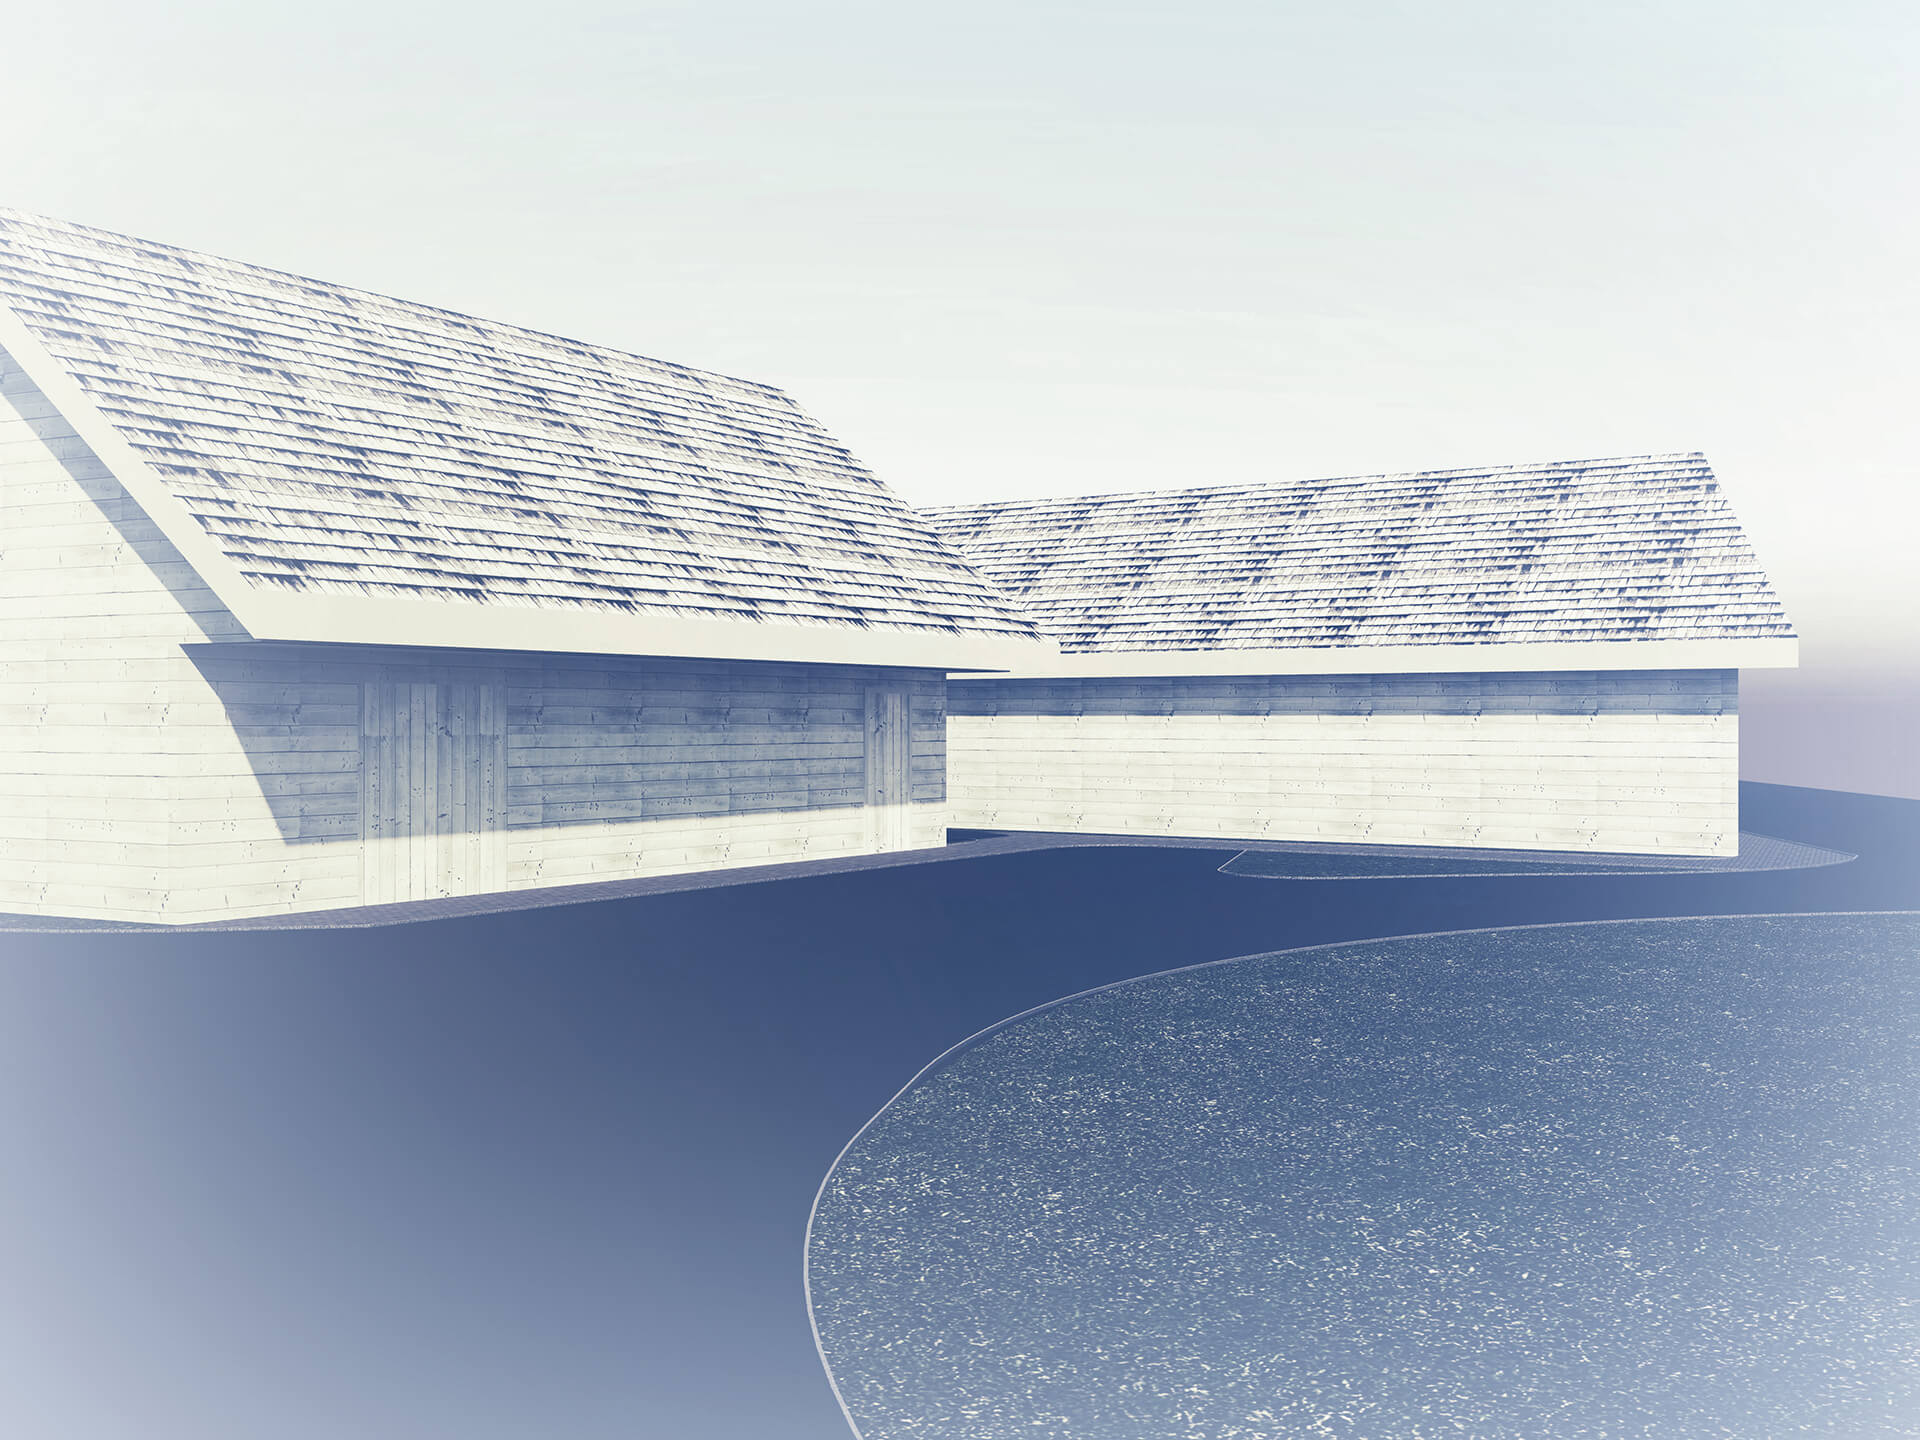 https://laagaarchitects.lv/wp-content/uploads/2019/11/03-04-8-Ruuj.jpg